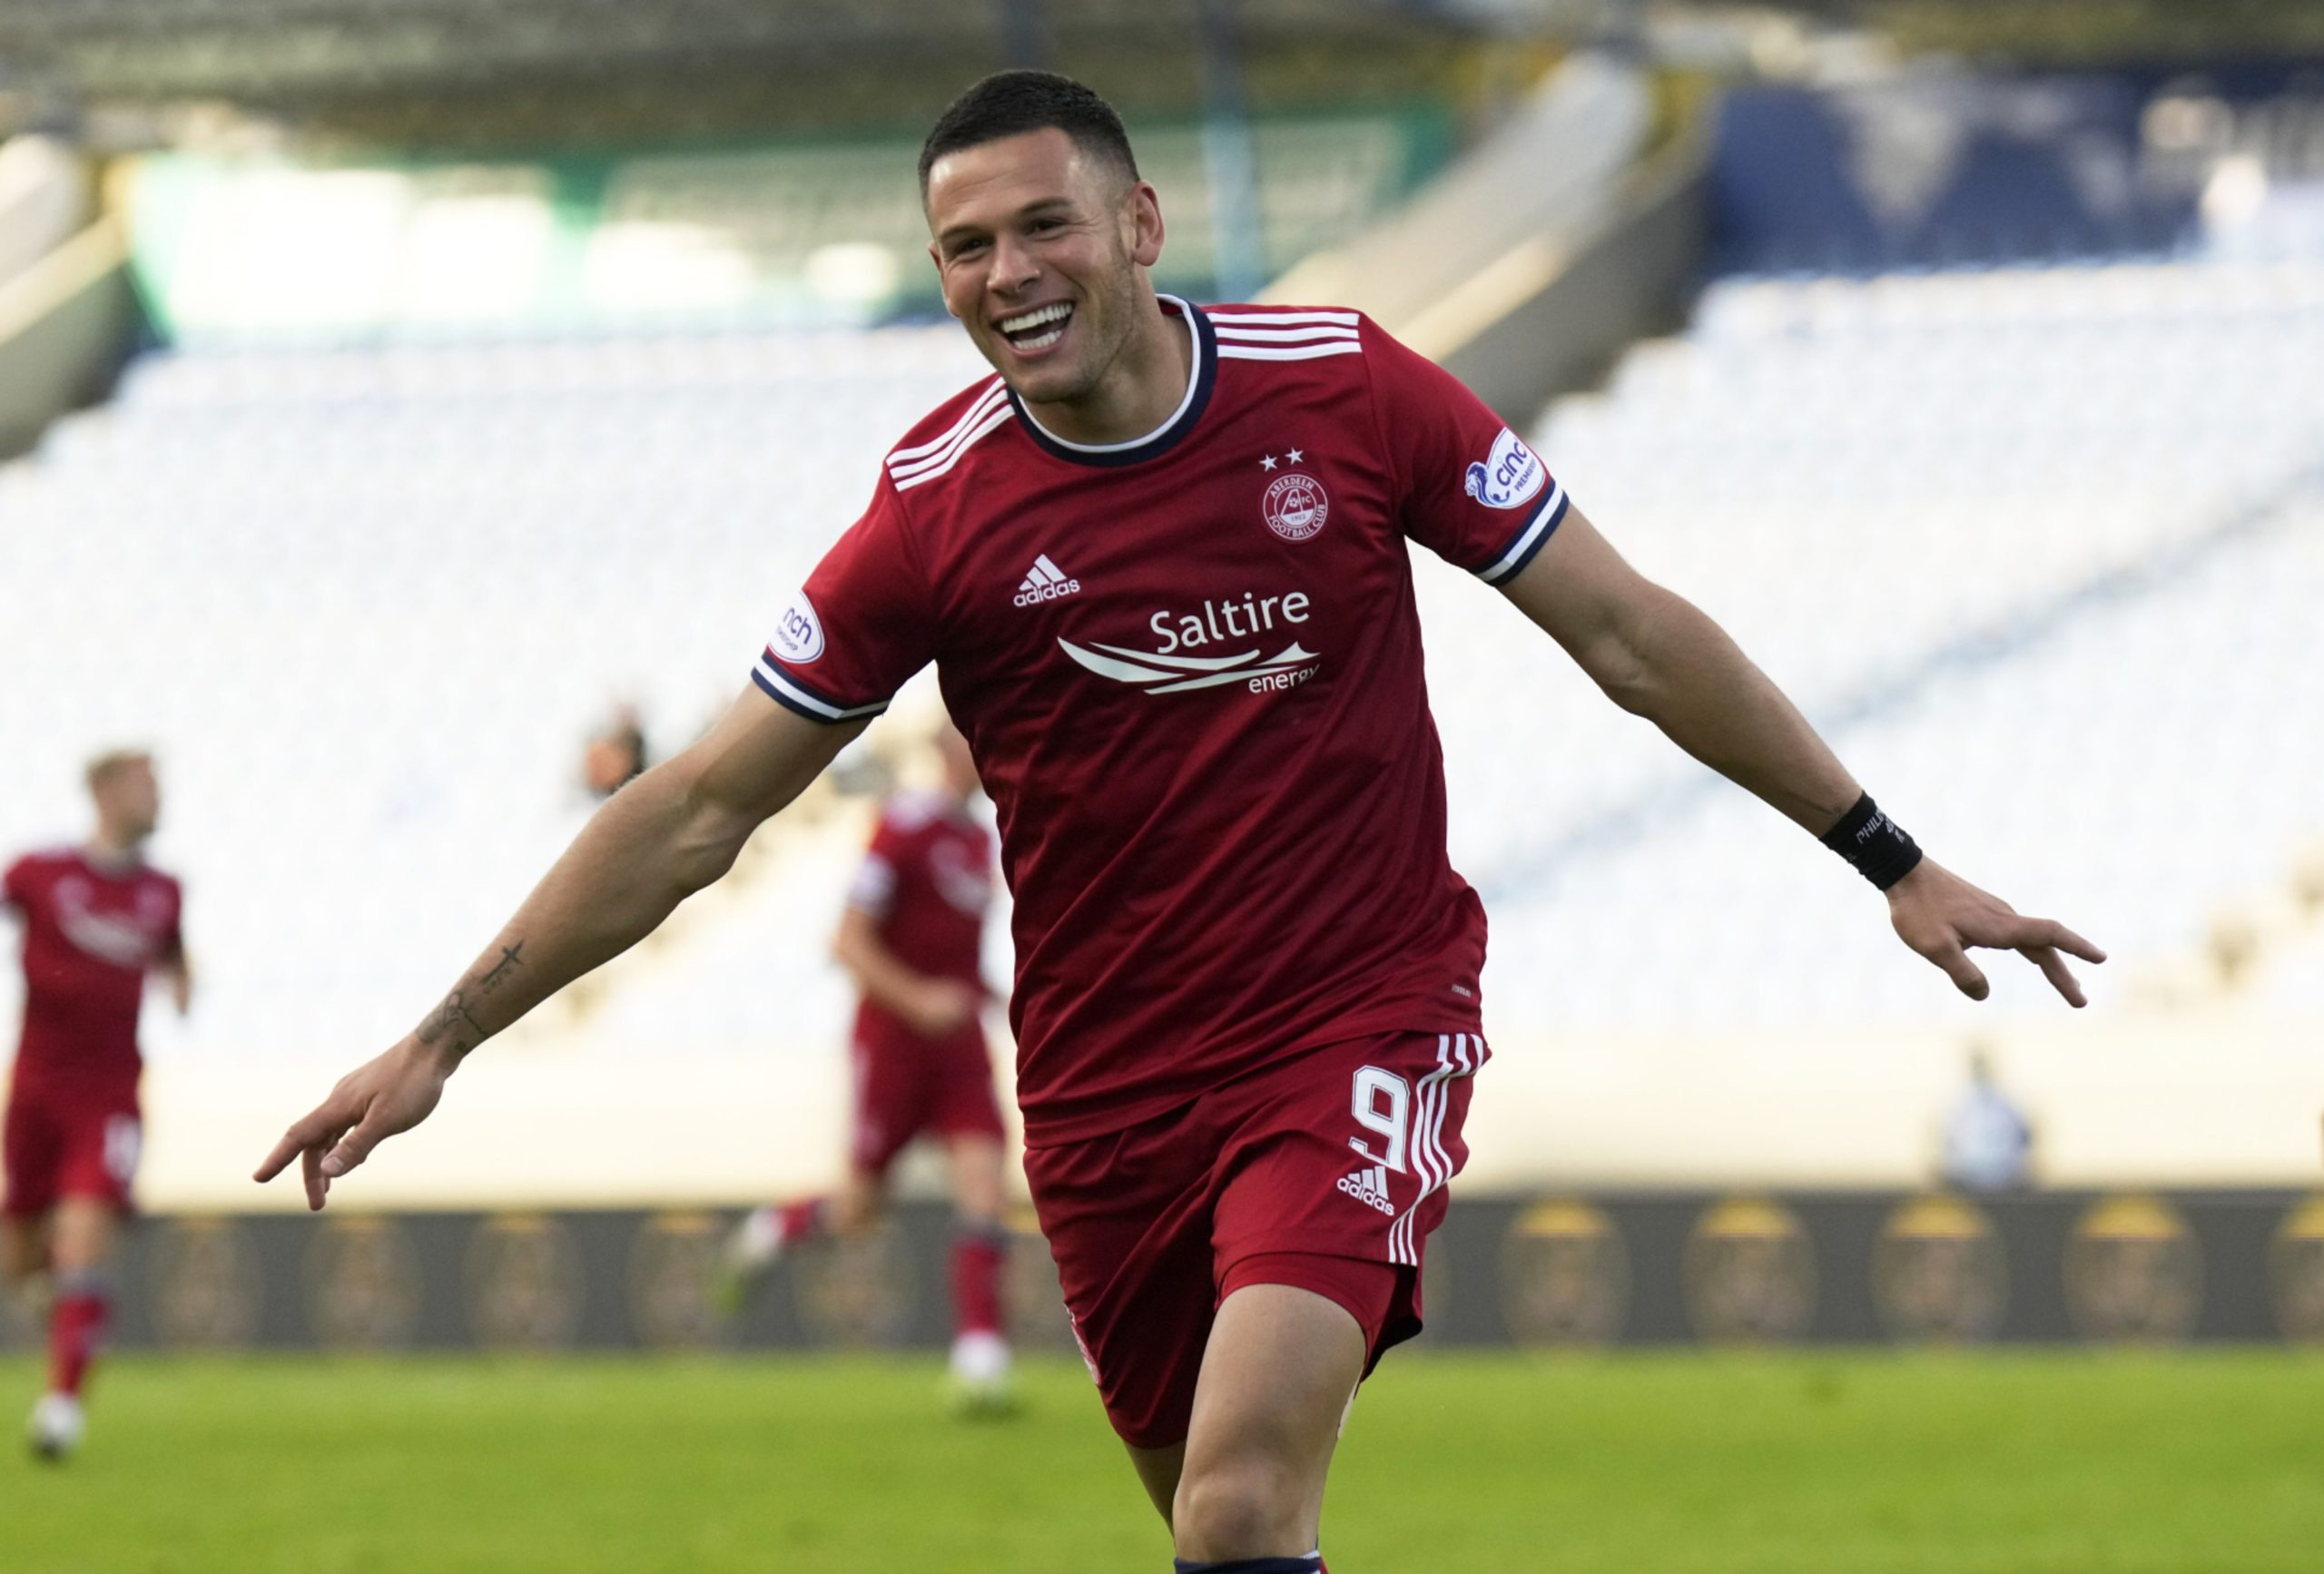 Christian Ramirez celebrates scoring for Aberdeen against Breidablik.